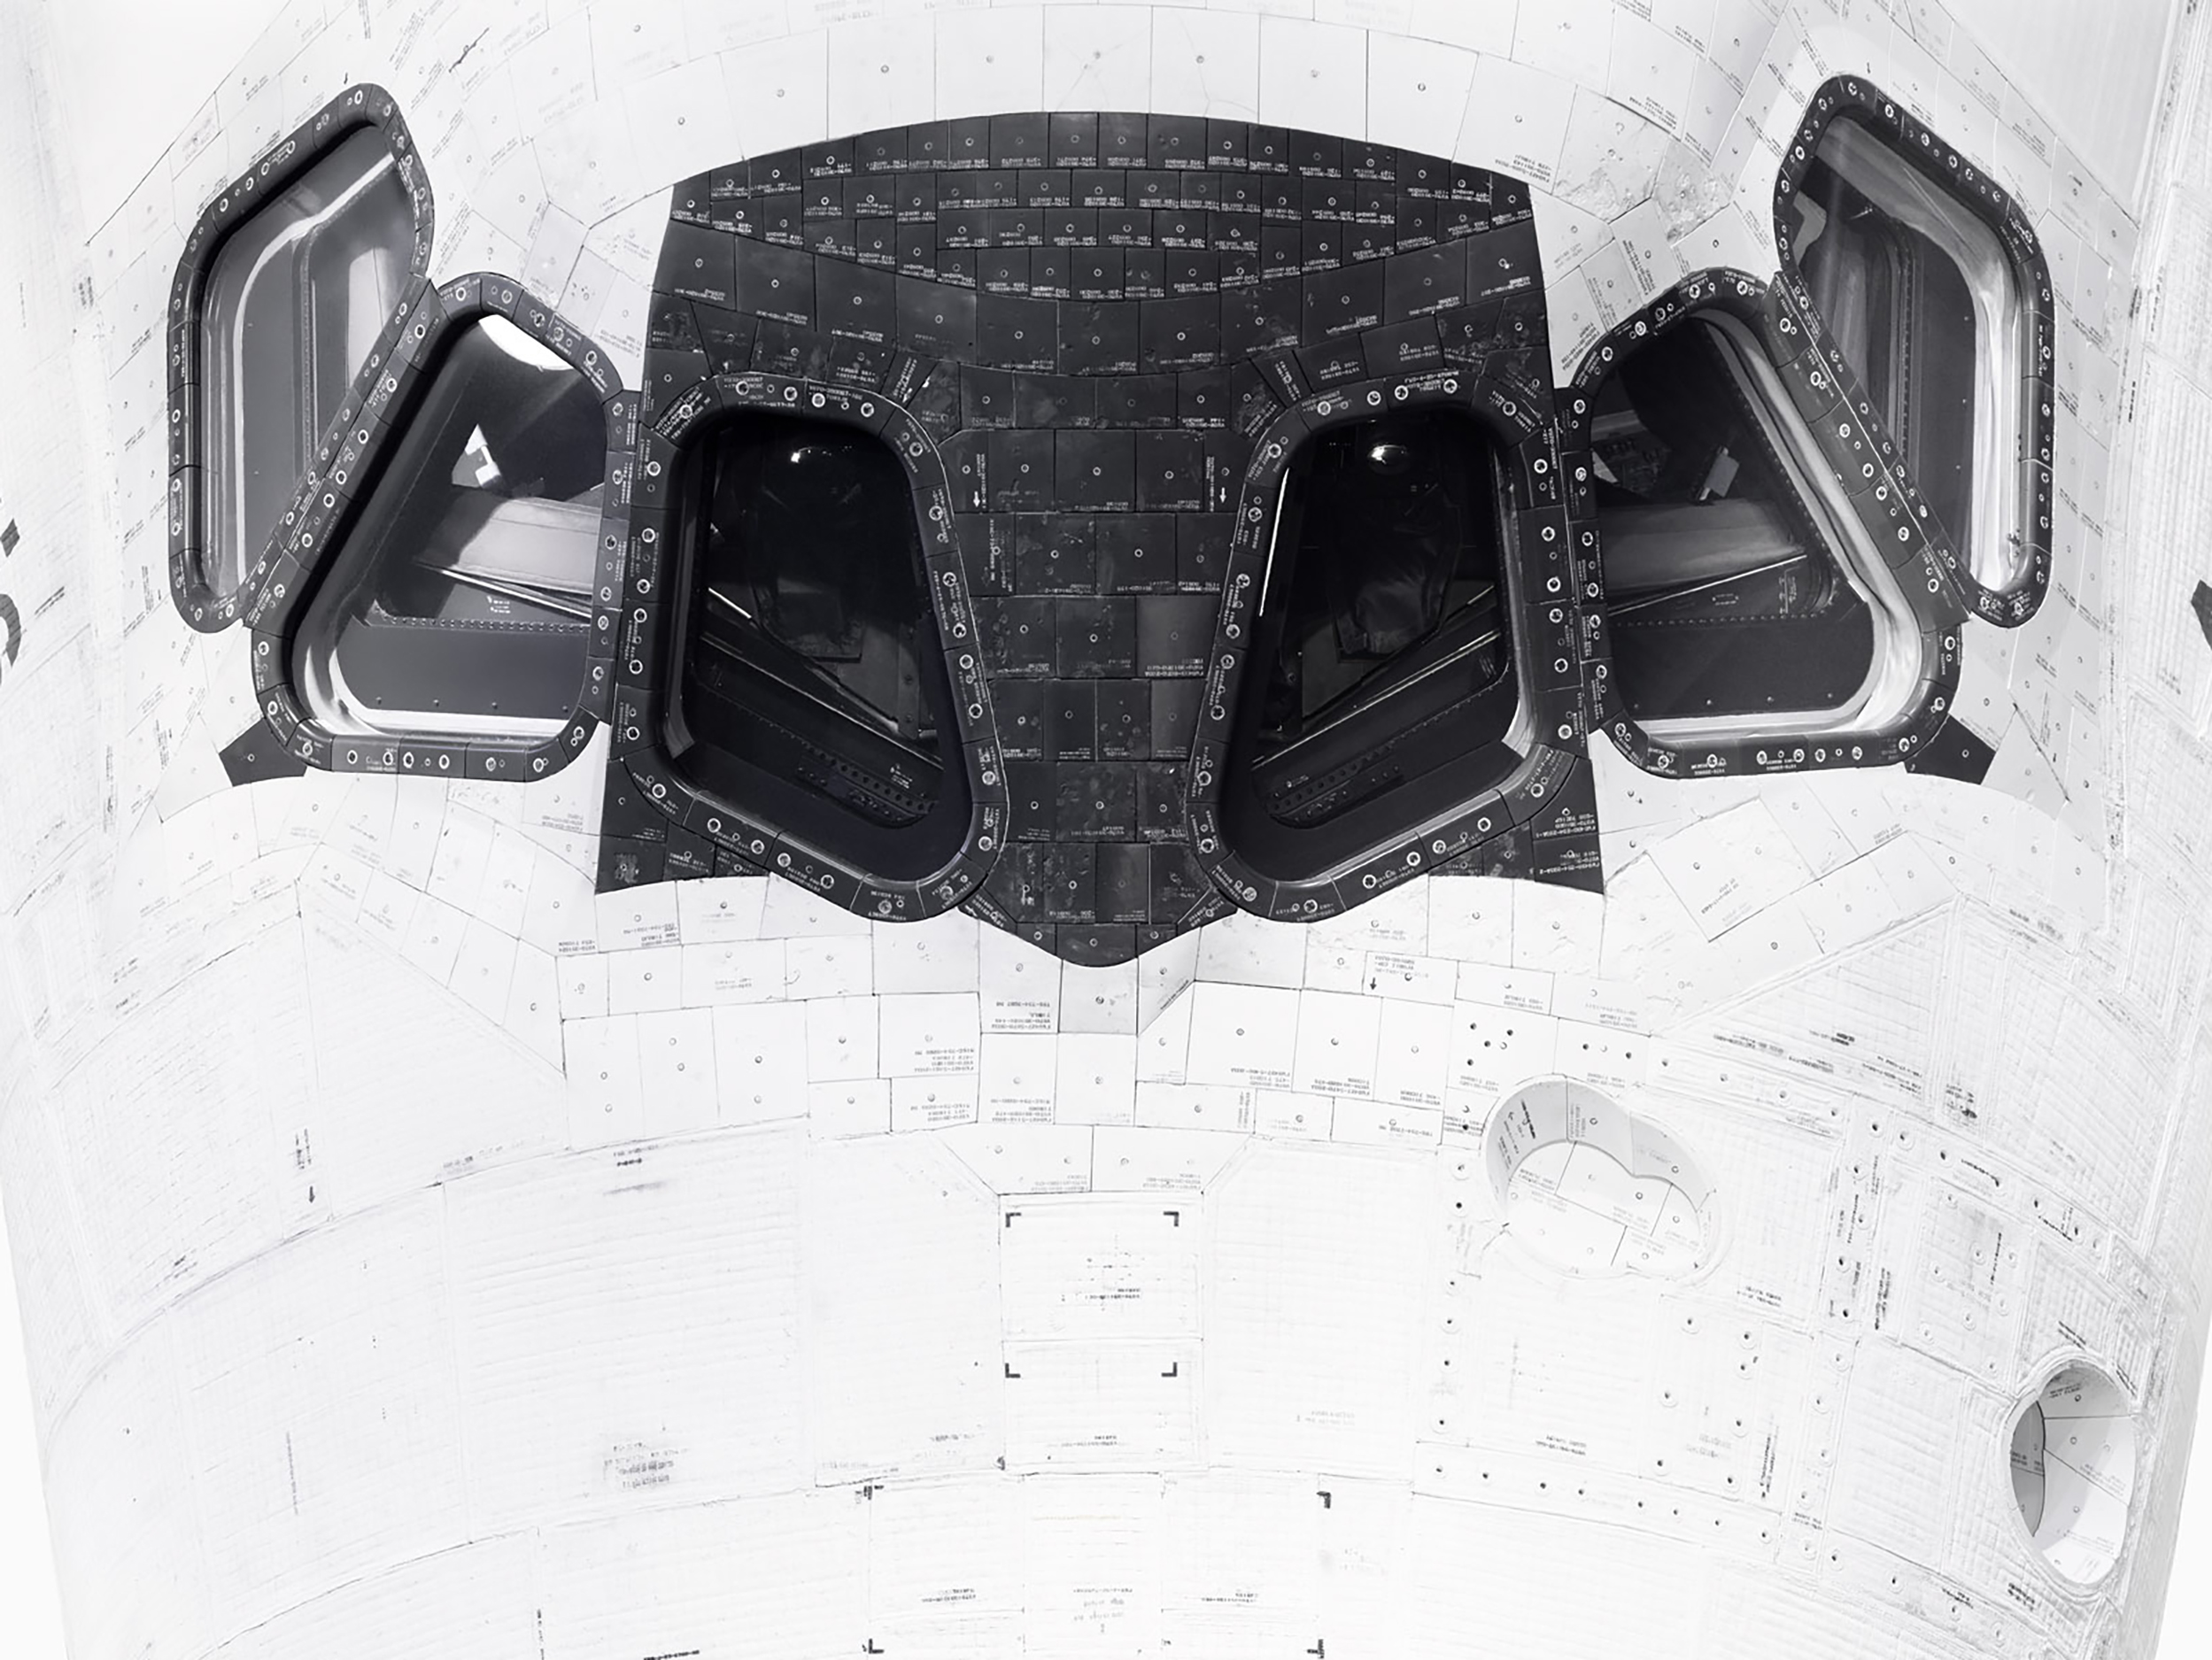 SPACE SHUTTLE ATLANTIS NOSEm - KENNEDY VISITORS CENTRE.jpg